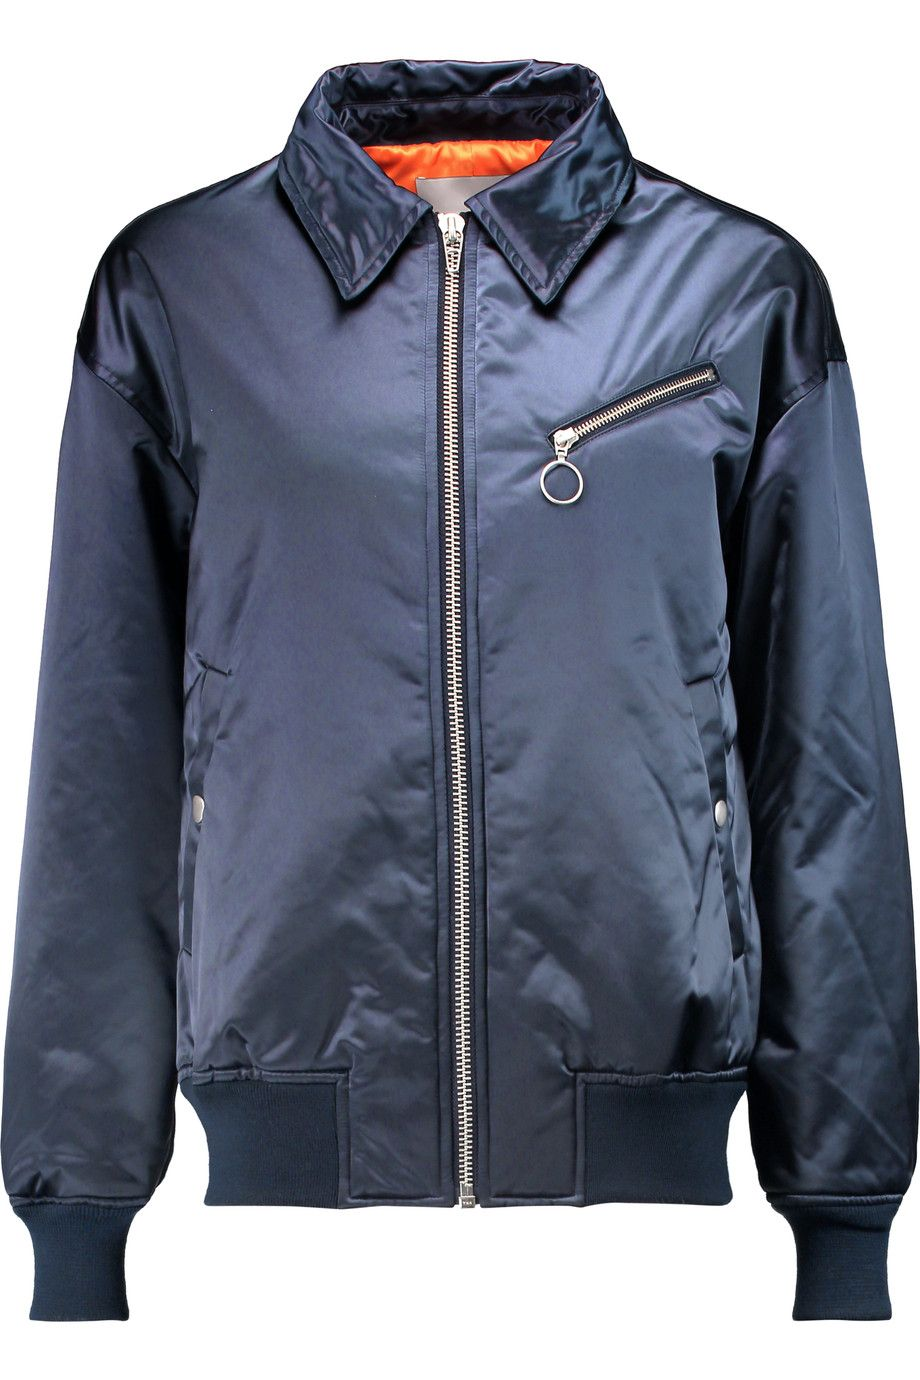 T BY ALEXANDER WANG Satin-shell bomber jacket. #tbyalexanderwang #cloth #jacket